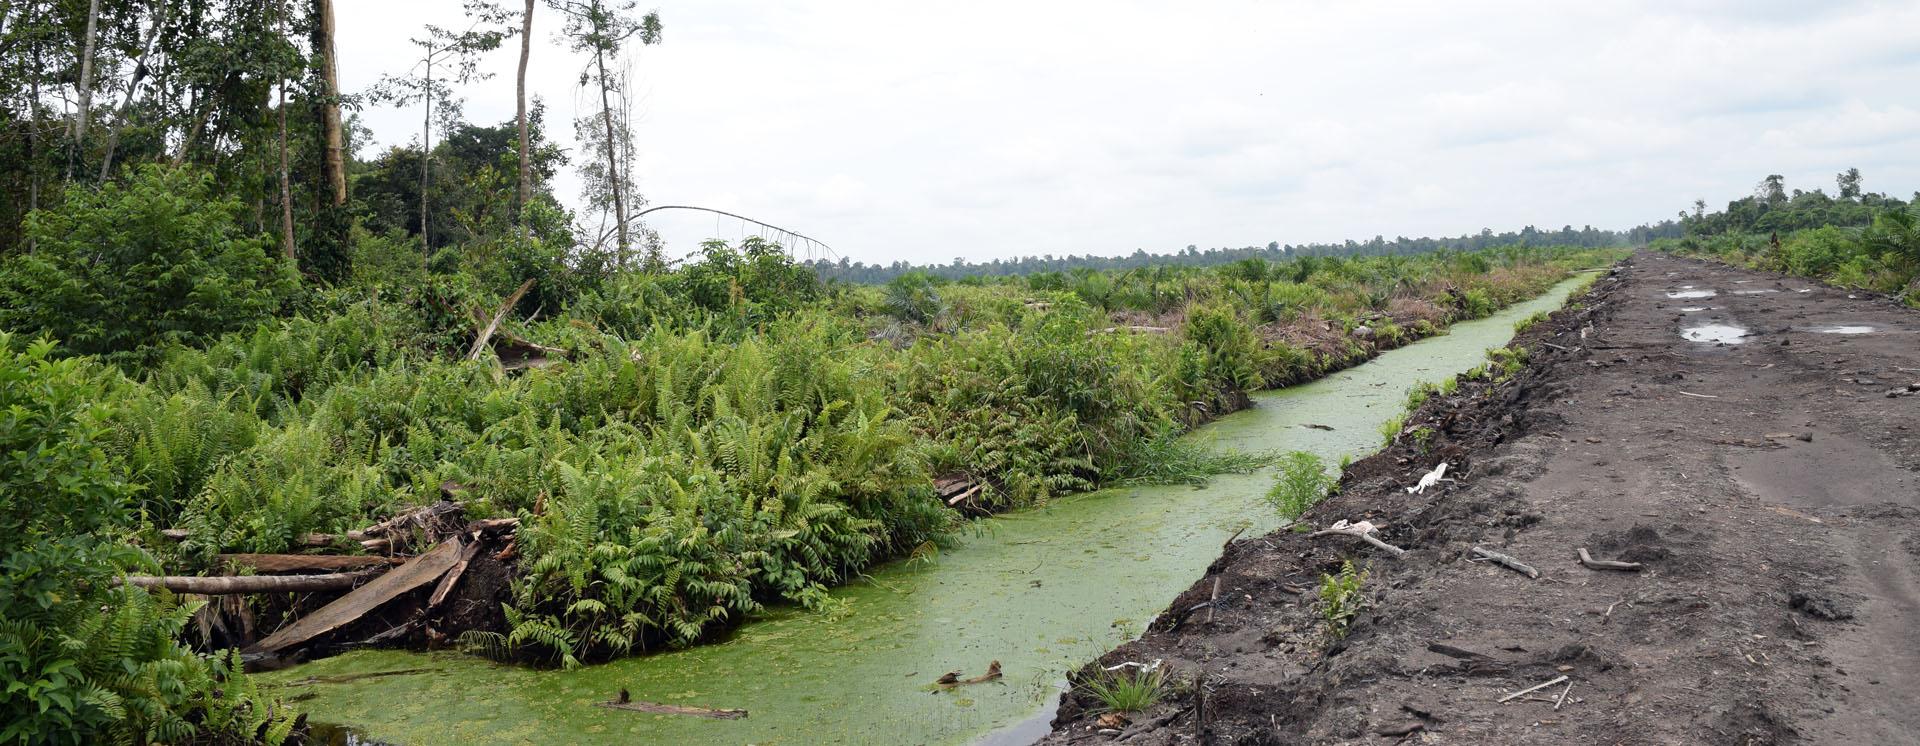 Veralgter Fluss in Pungkat